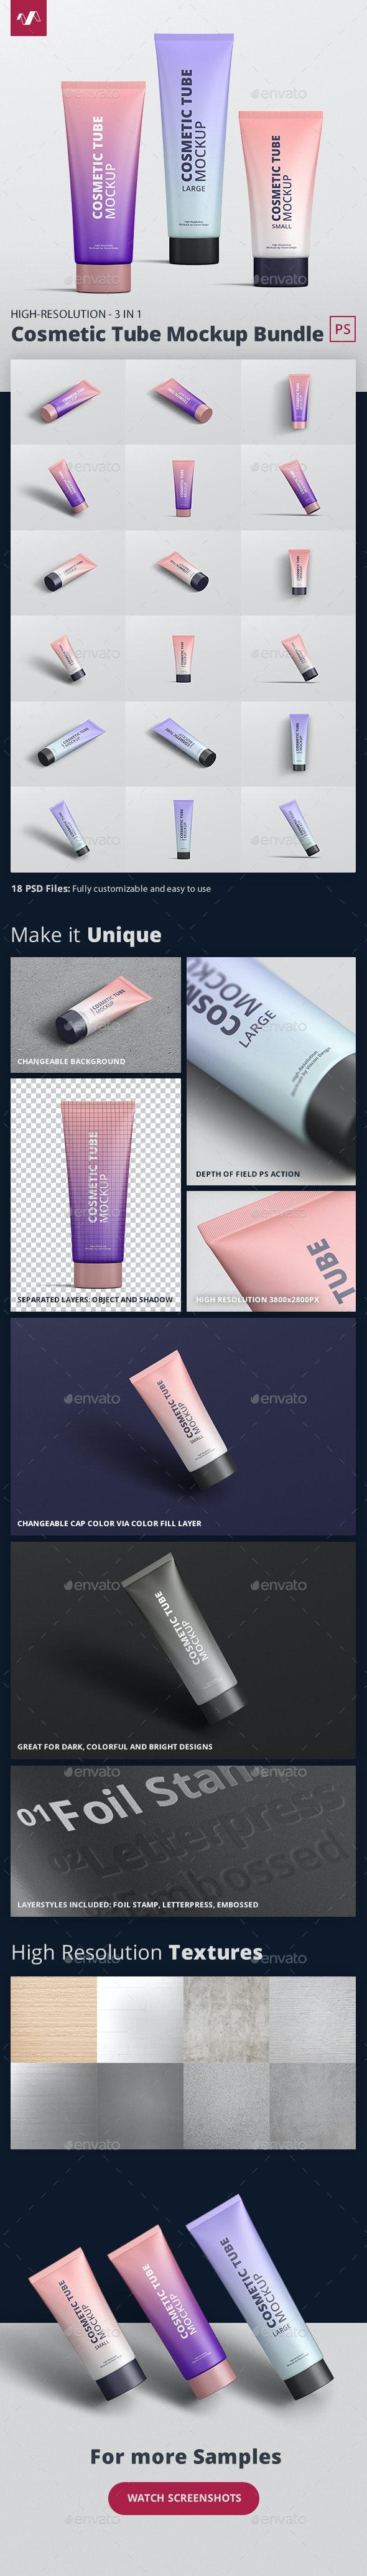 Cosmetic Tube Mockup Bundle - Beauty Packaging